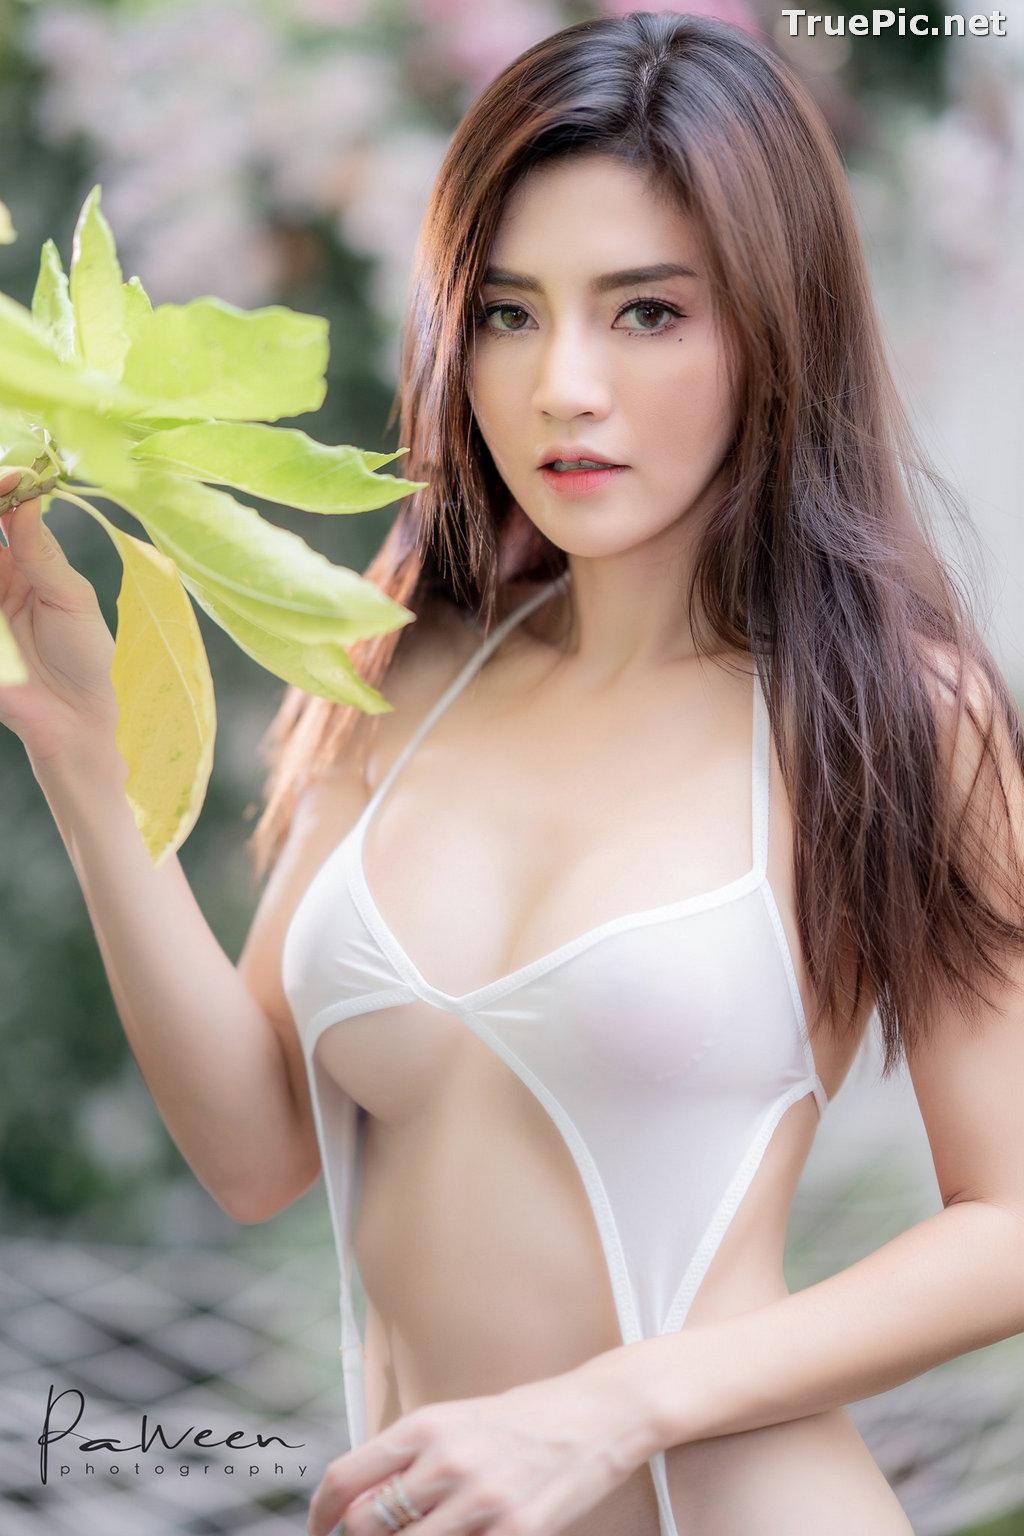 Image Thailand Model - Ladapa Ratchataamonchot - Sexy Garden - TruePic.net - Picture-4